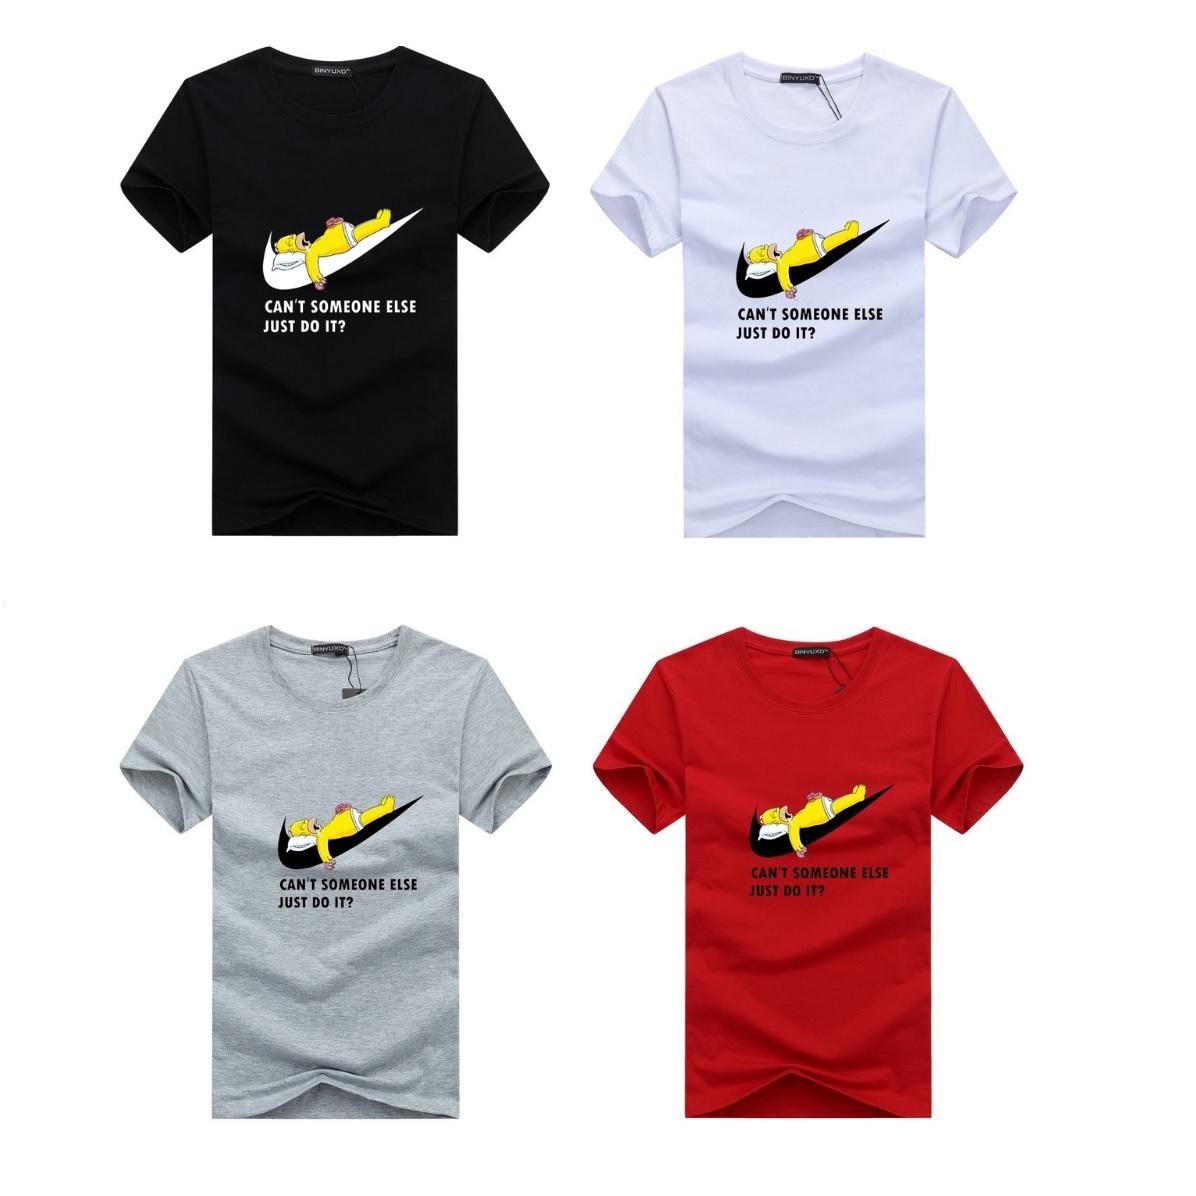 Pánské tričko - Homer Simpson / tnk-13-01364